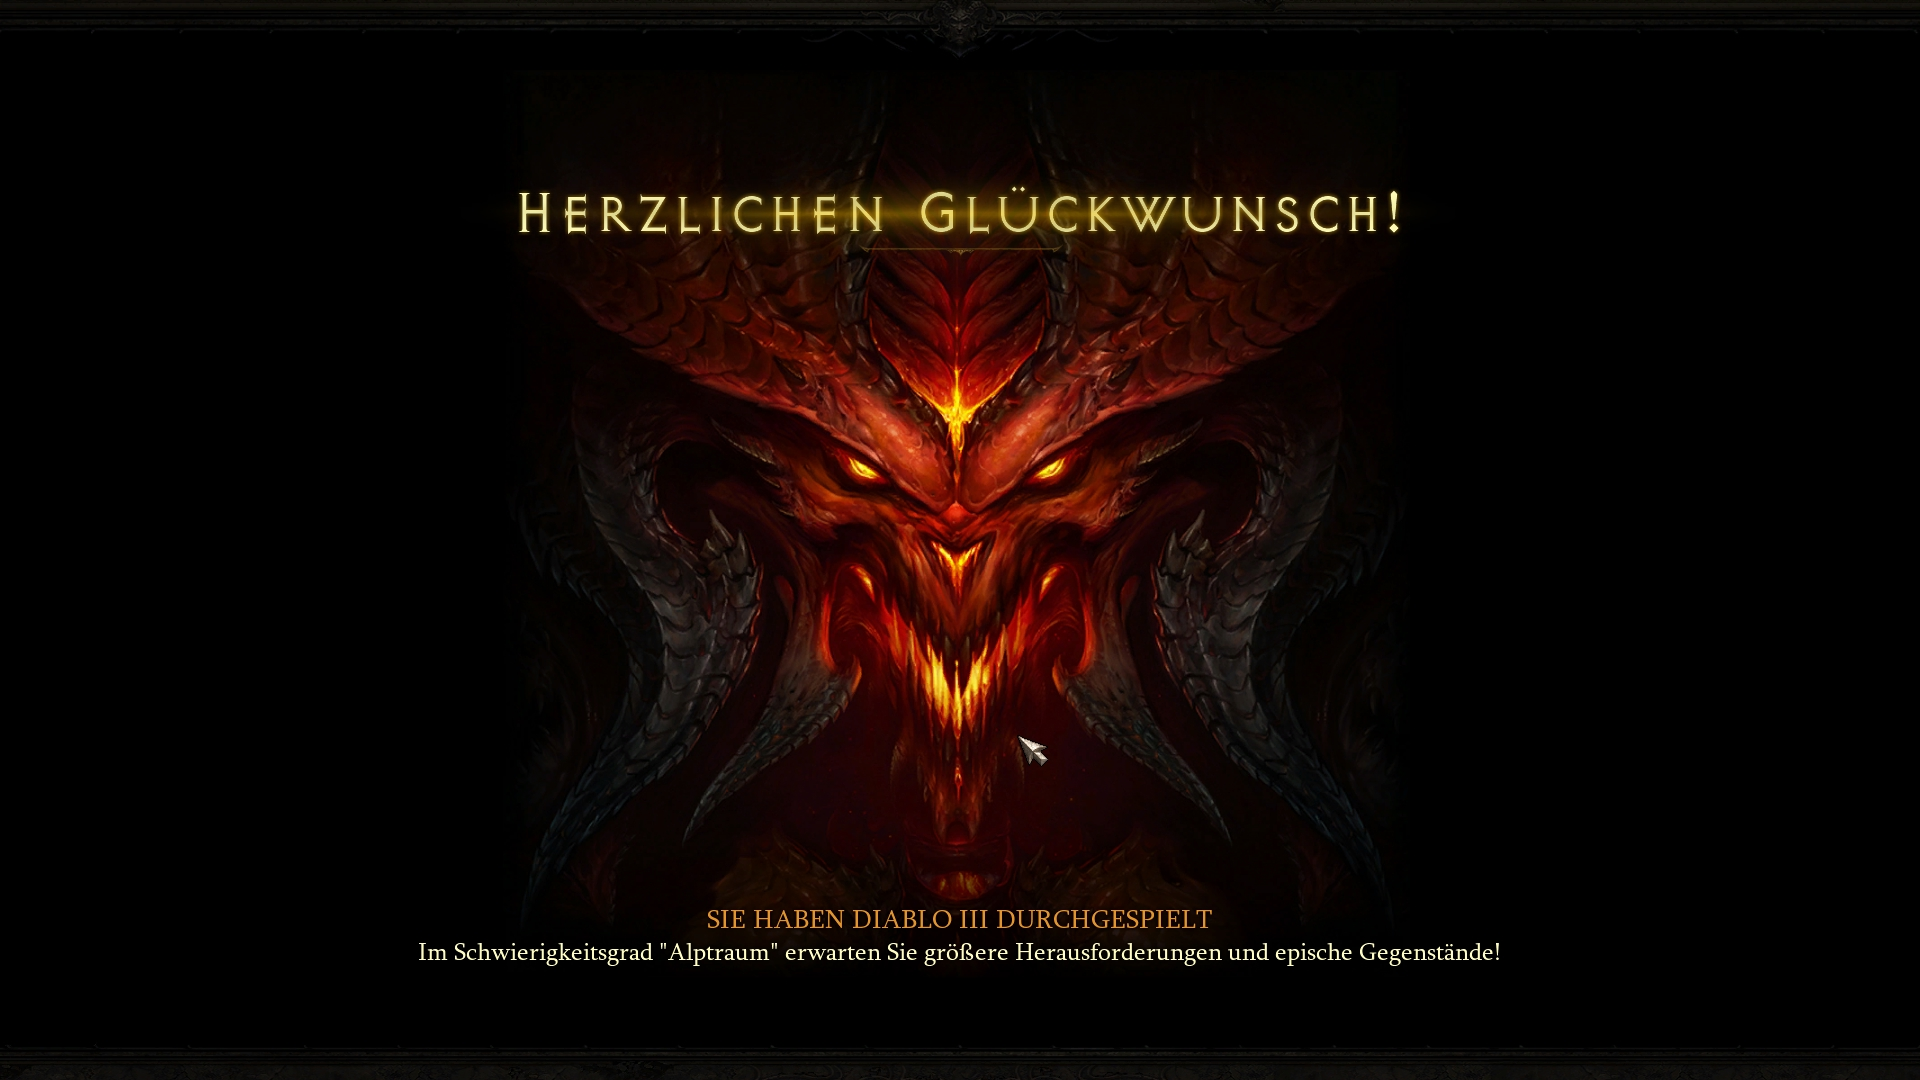 Diablo3 durchgespielt – Mein Fazit